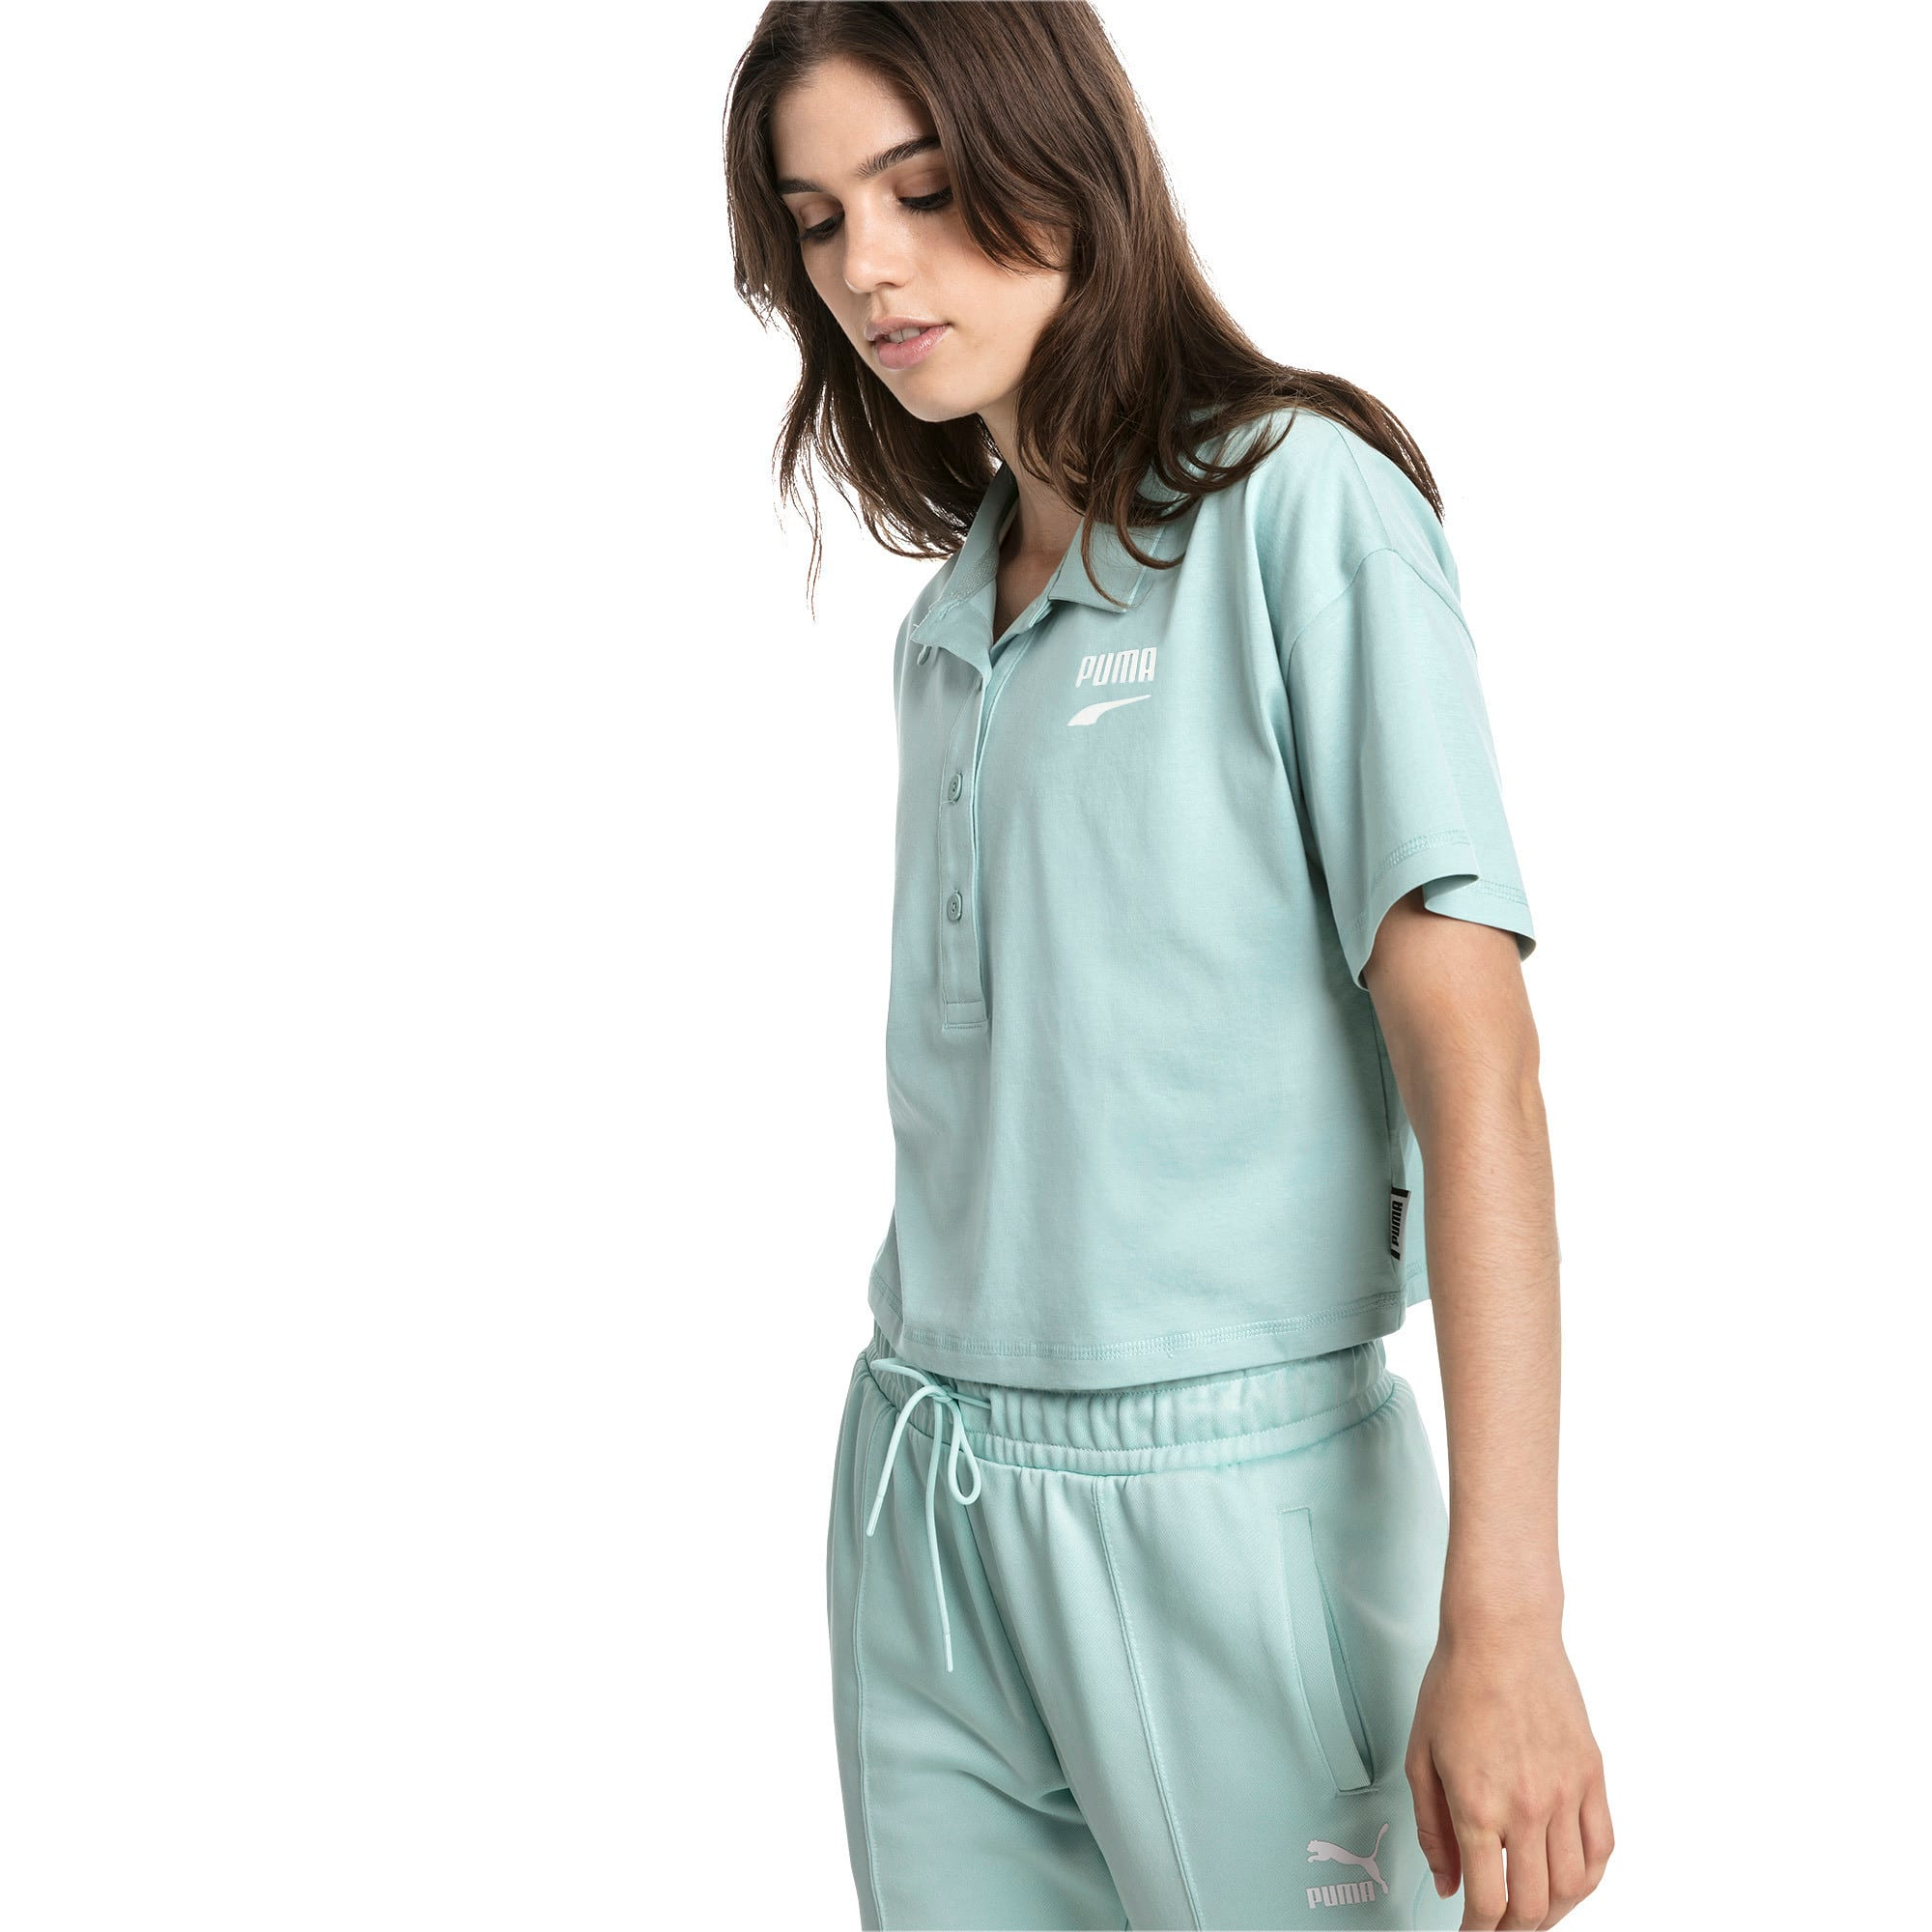 Thumbnail 3 of Downtown Women's Polo Shirt, Aquifer, medium-IND